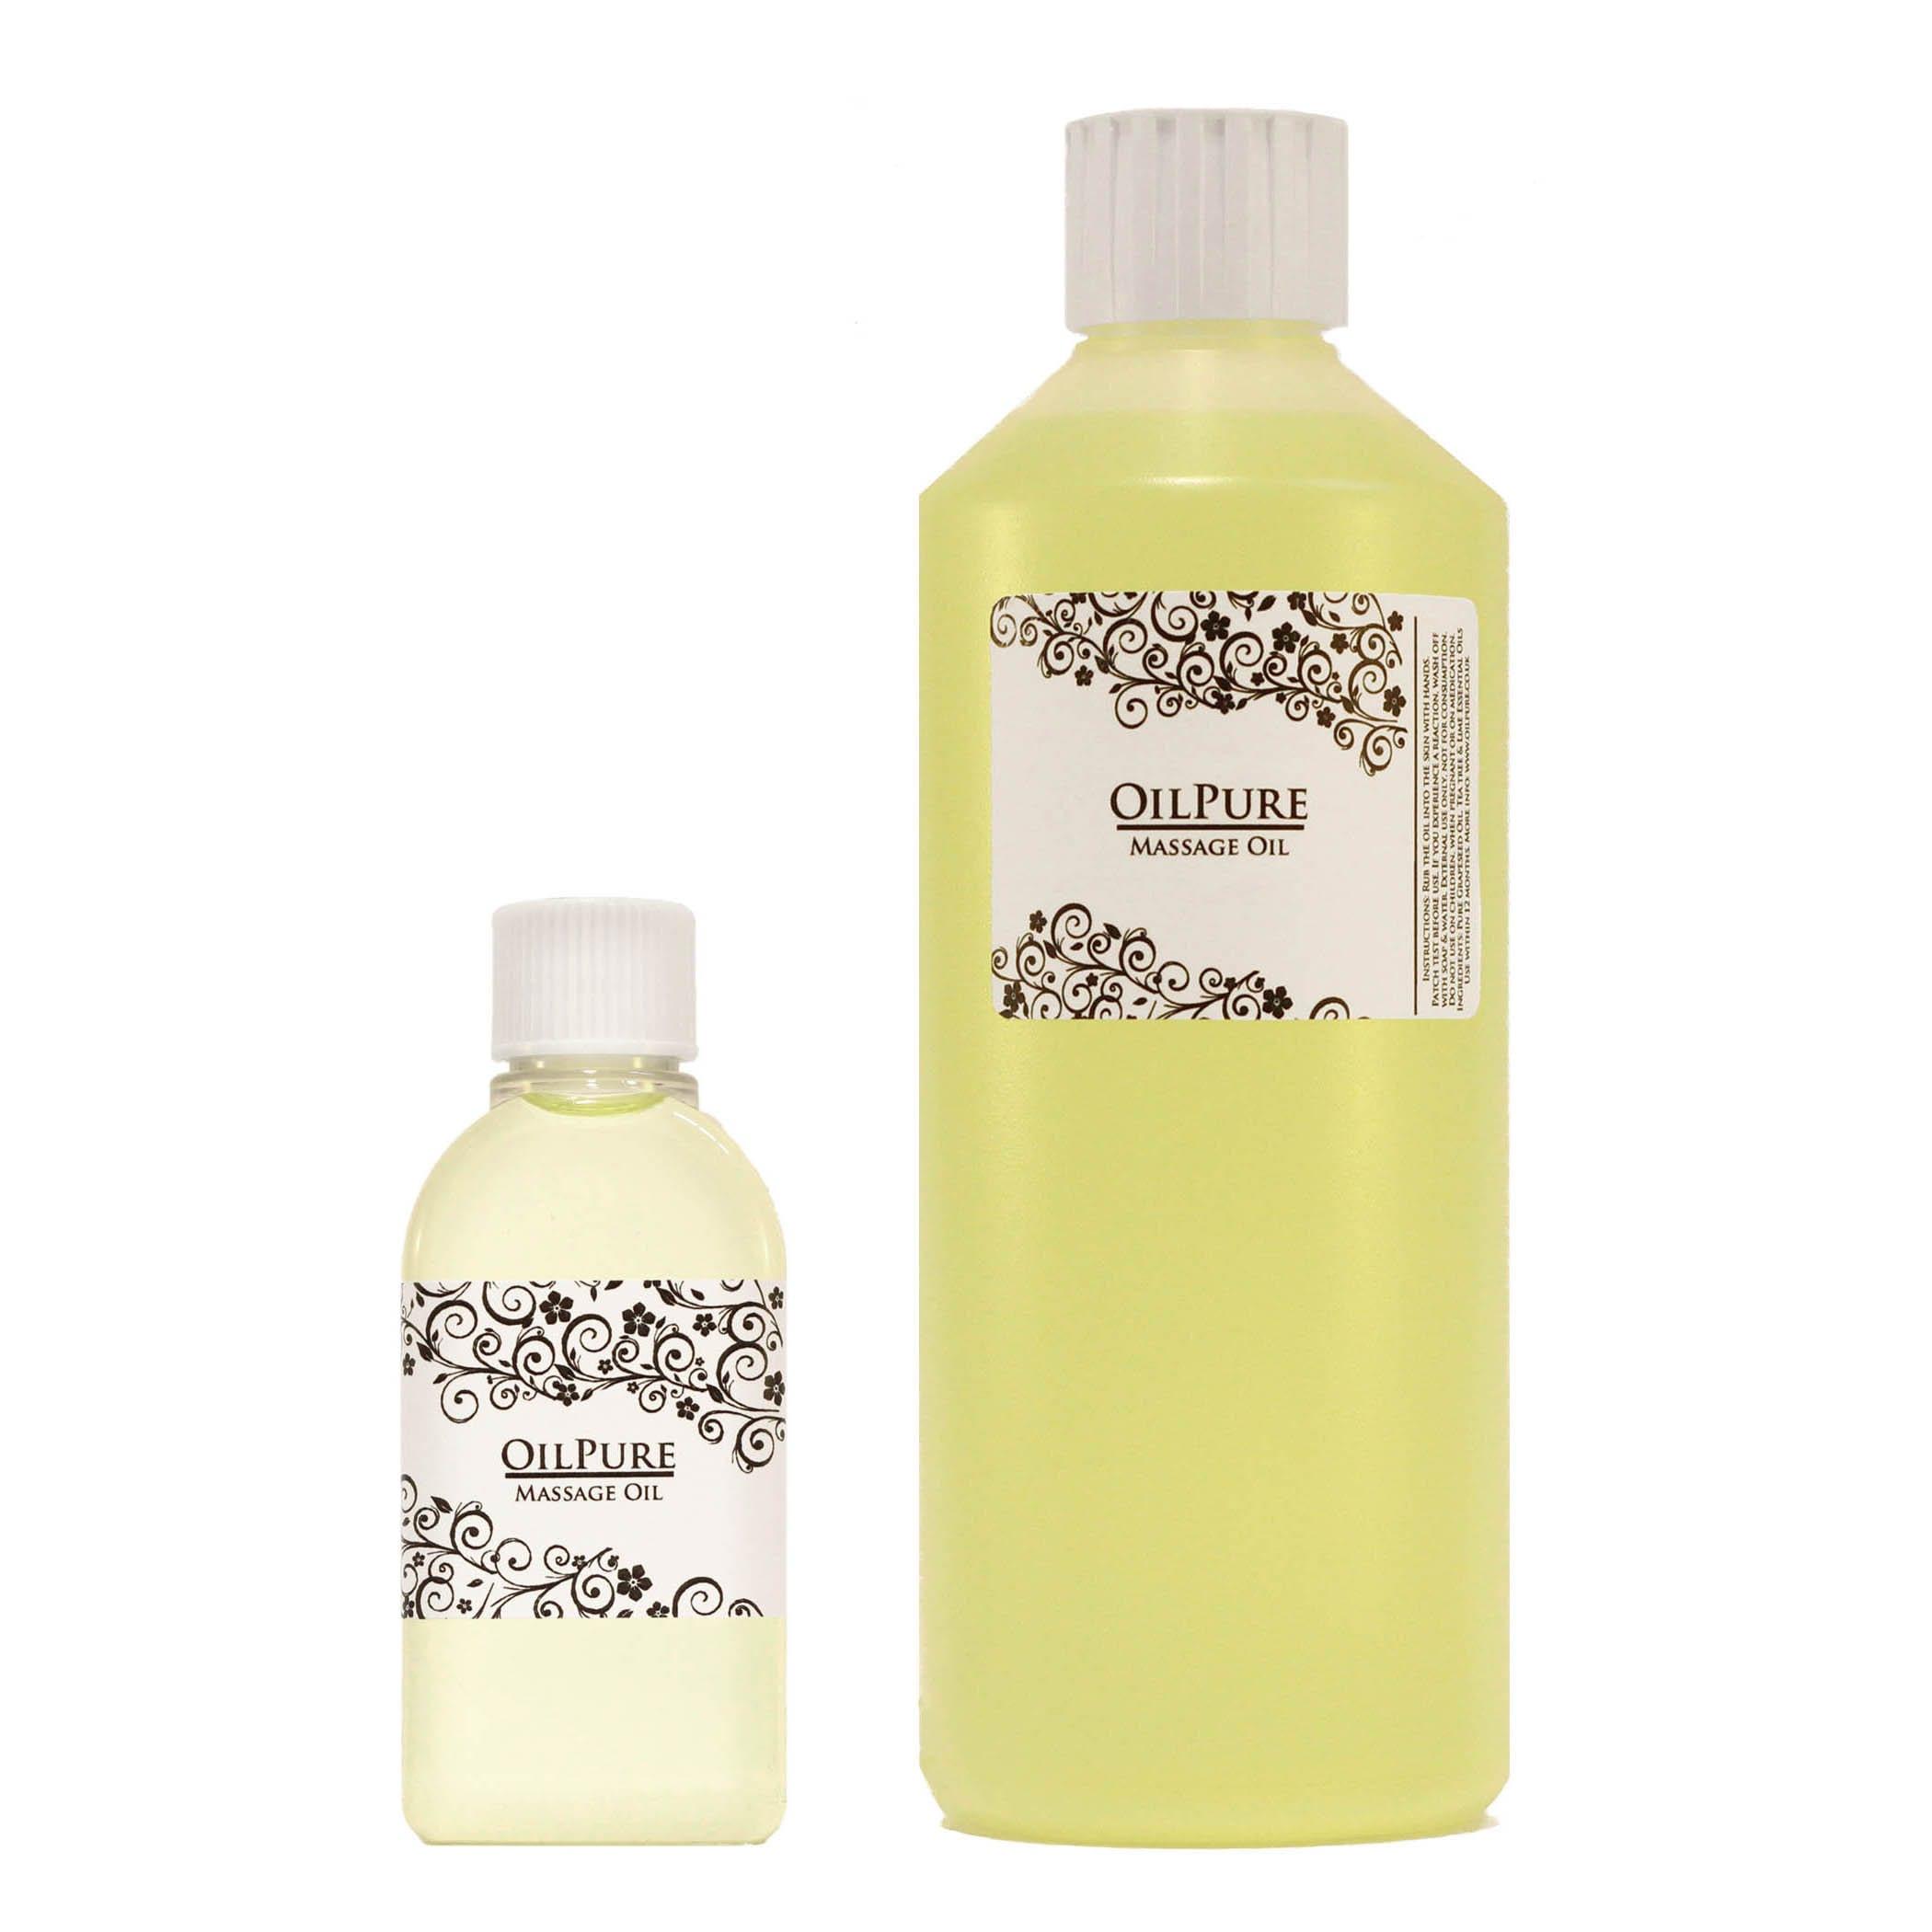 A Sensual Massage massage oil sensual blend, erotic aphrodisiac romantic, pure natural oils.